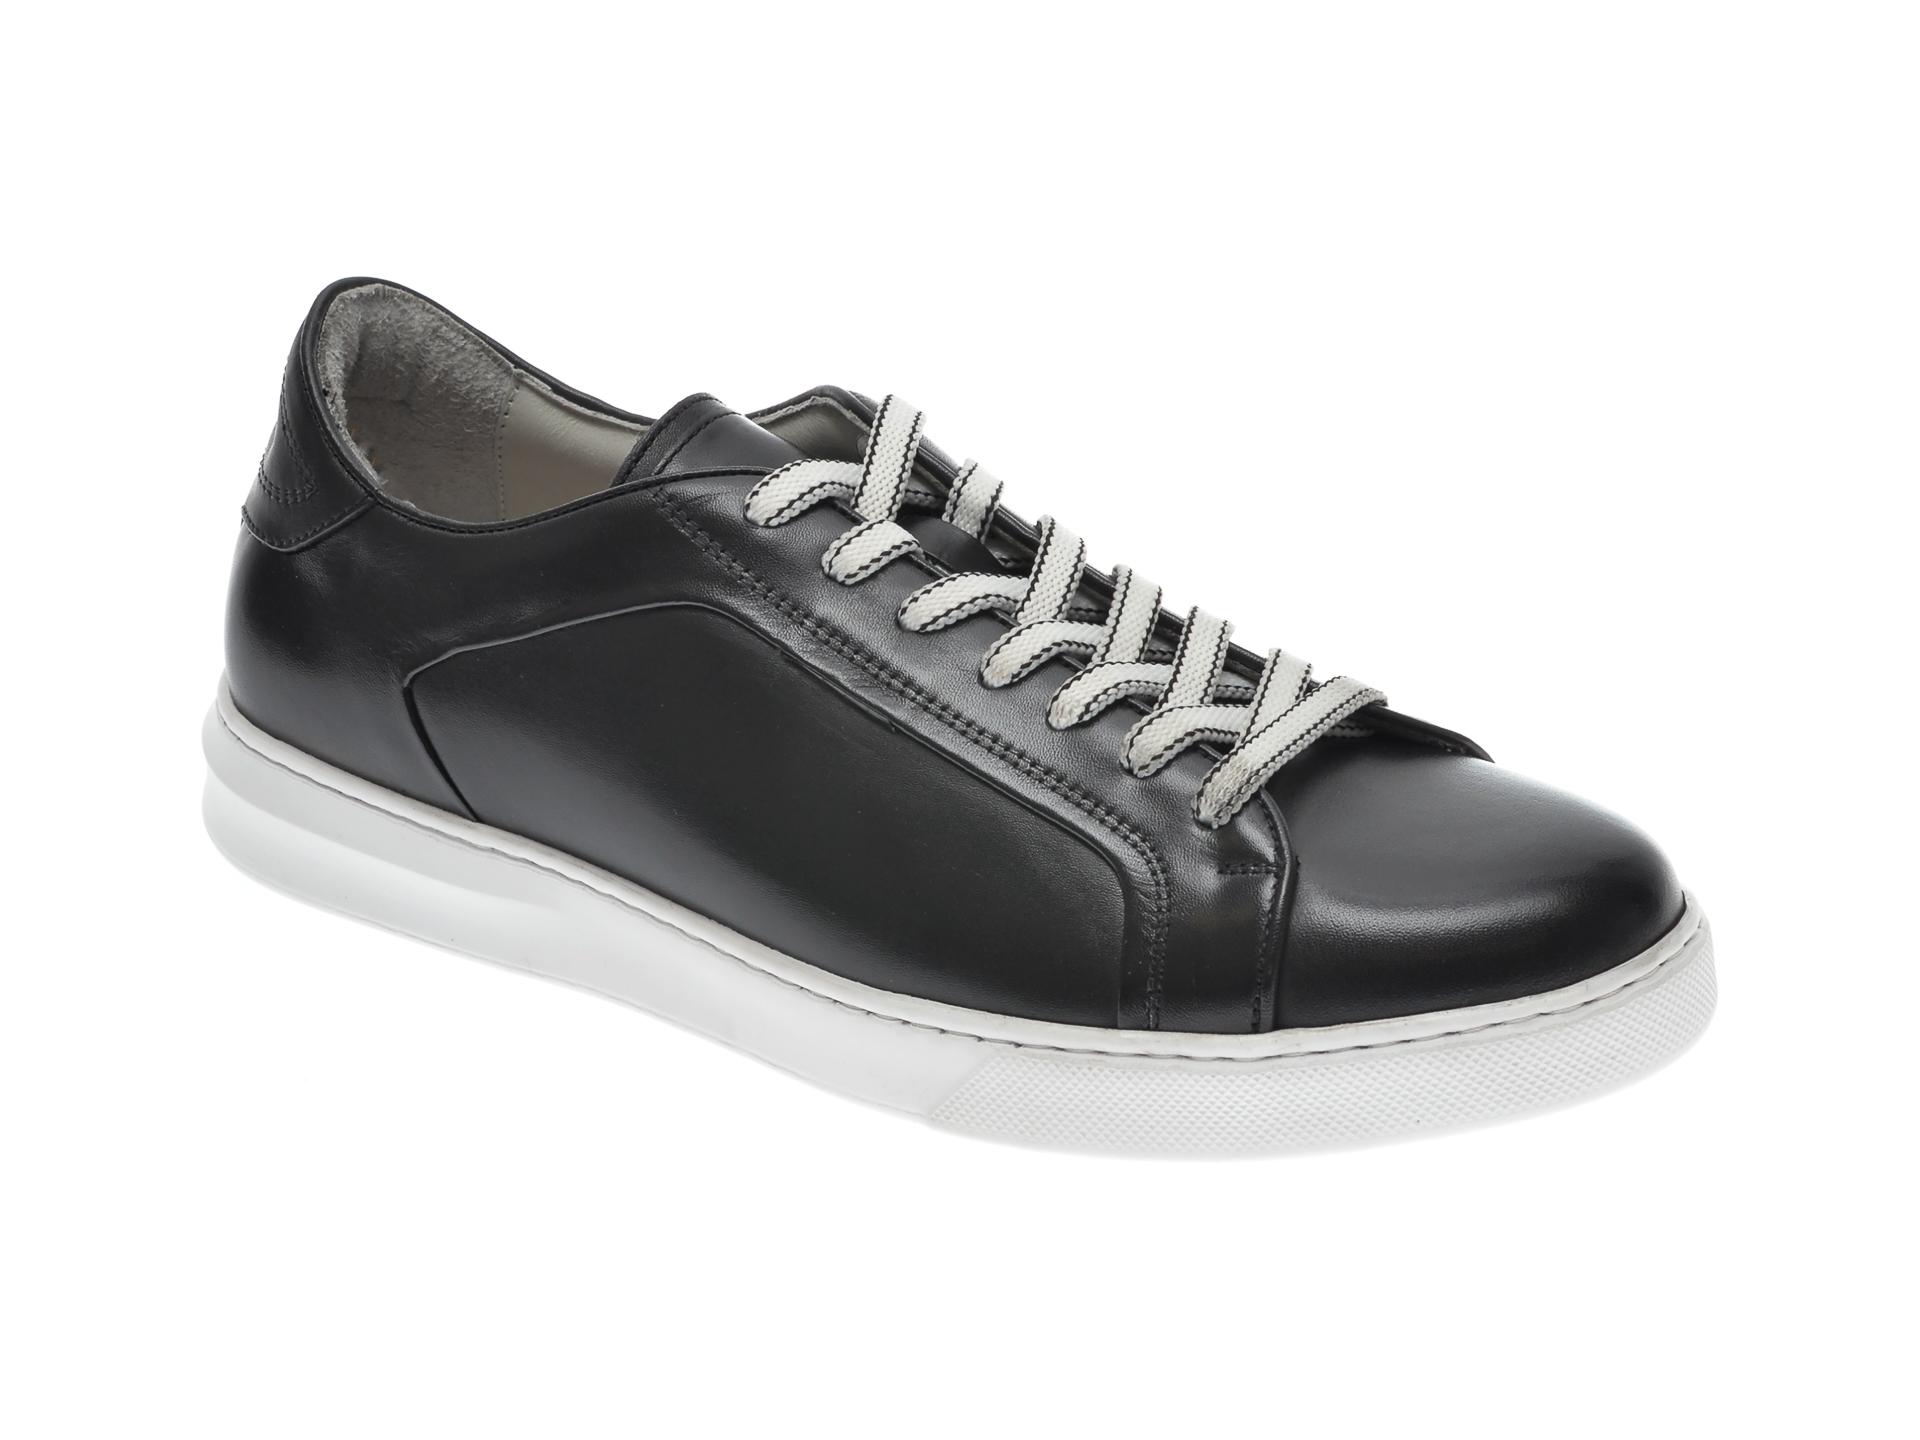 Pantofi OTTER negri, 3384, din piele naturala imagine